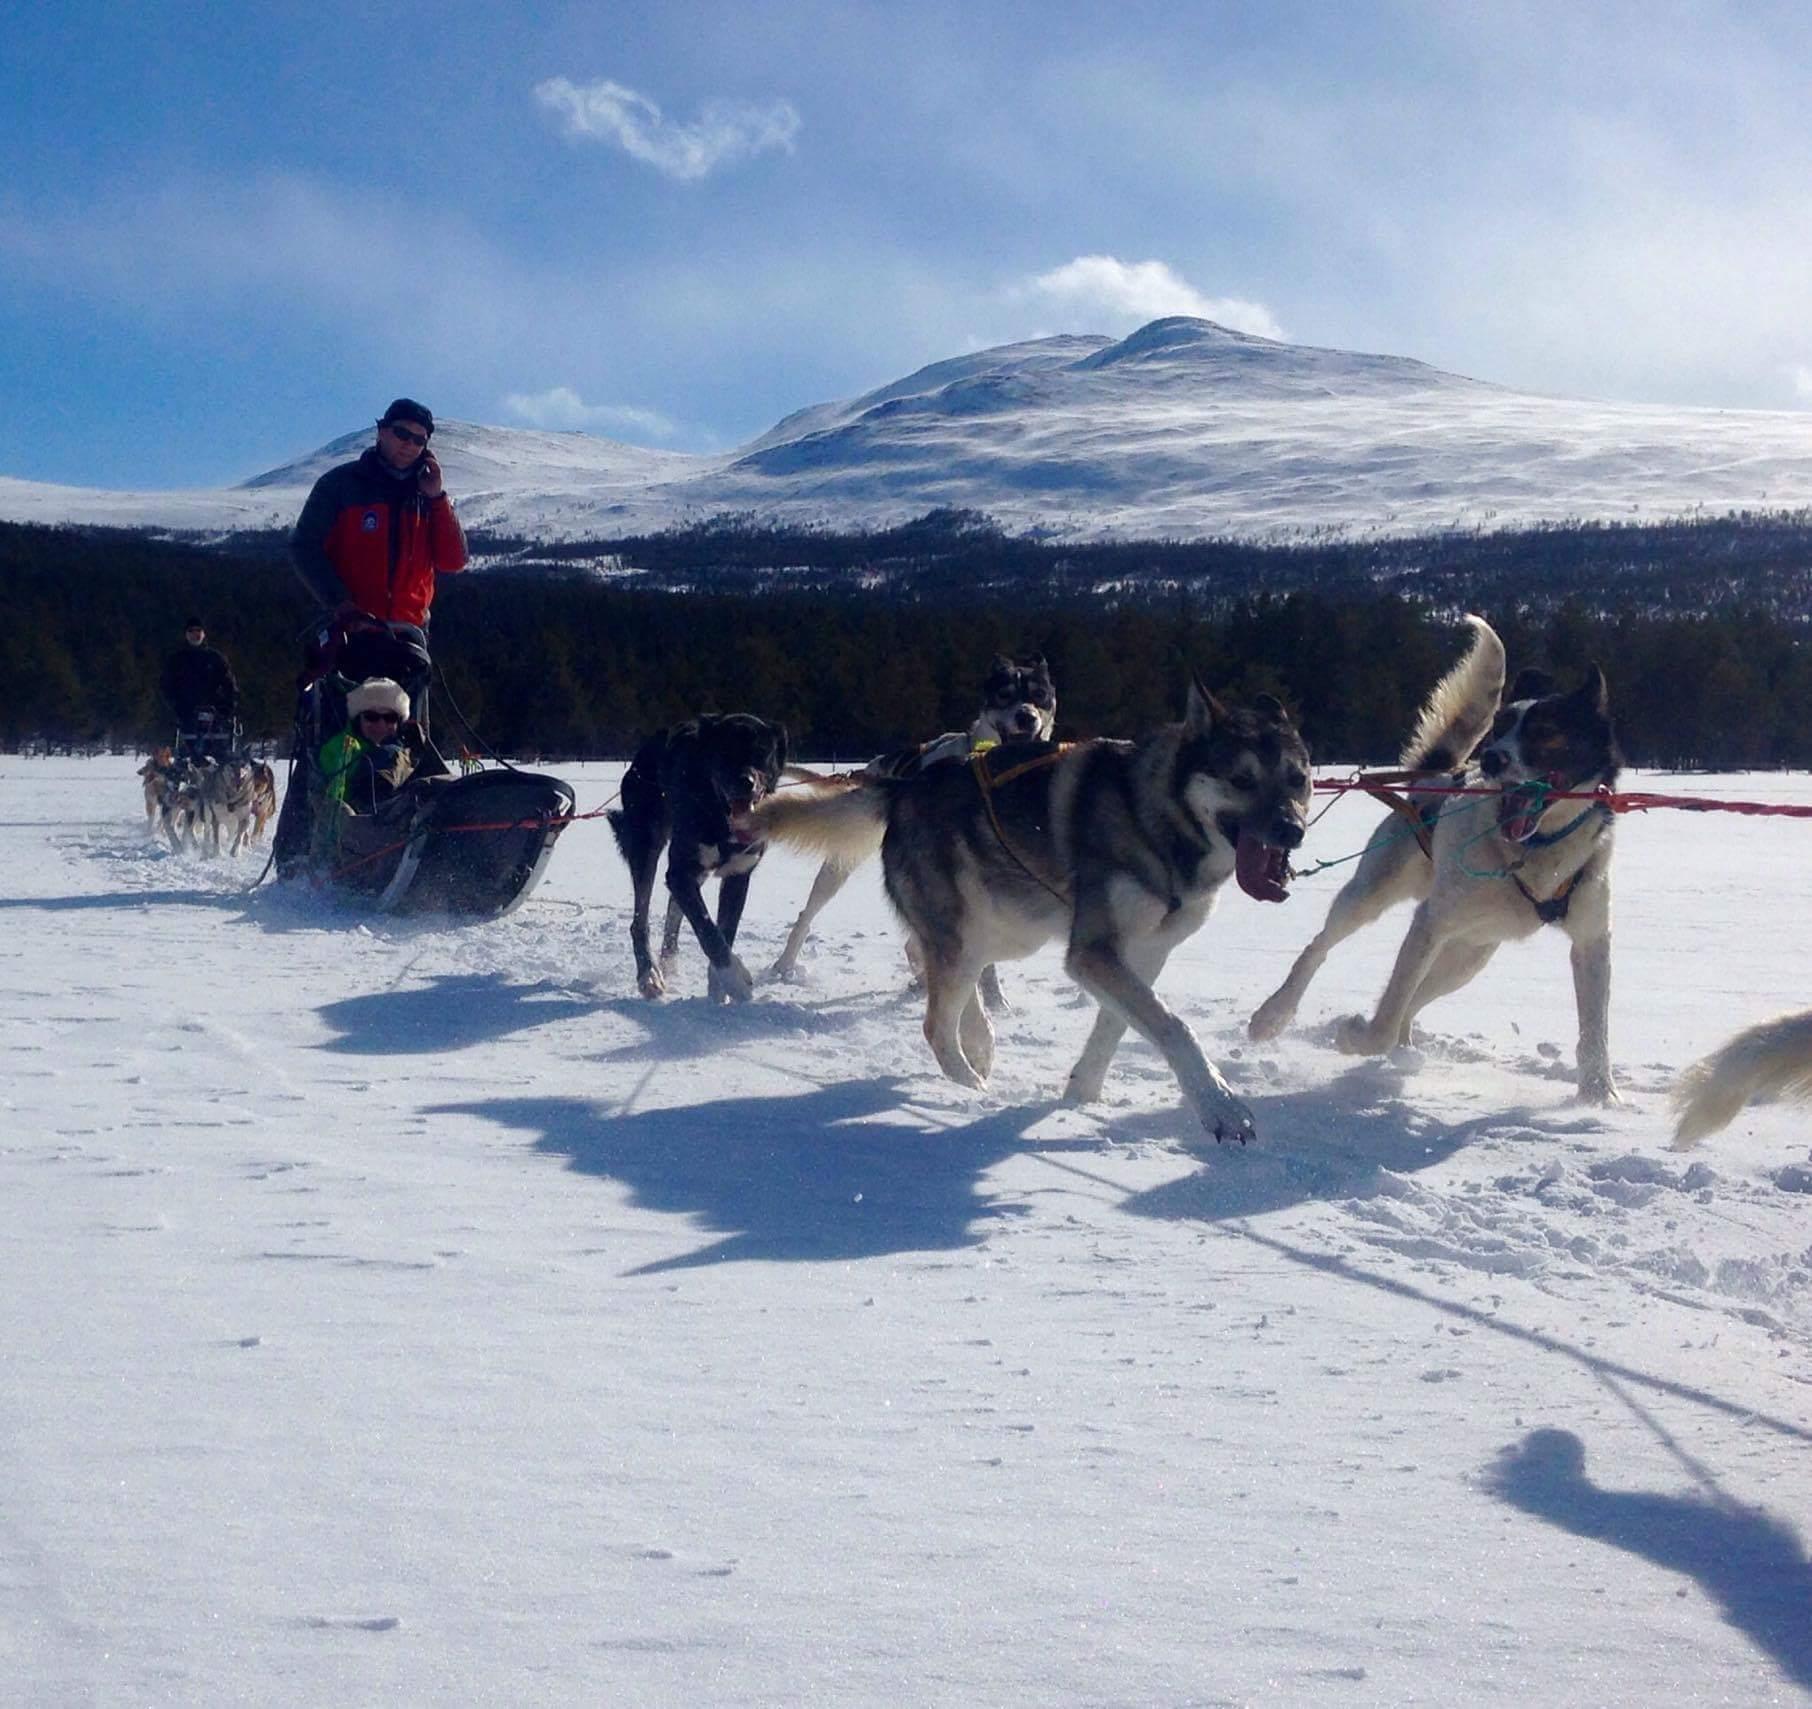 Dogsledding in Sjodalen